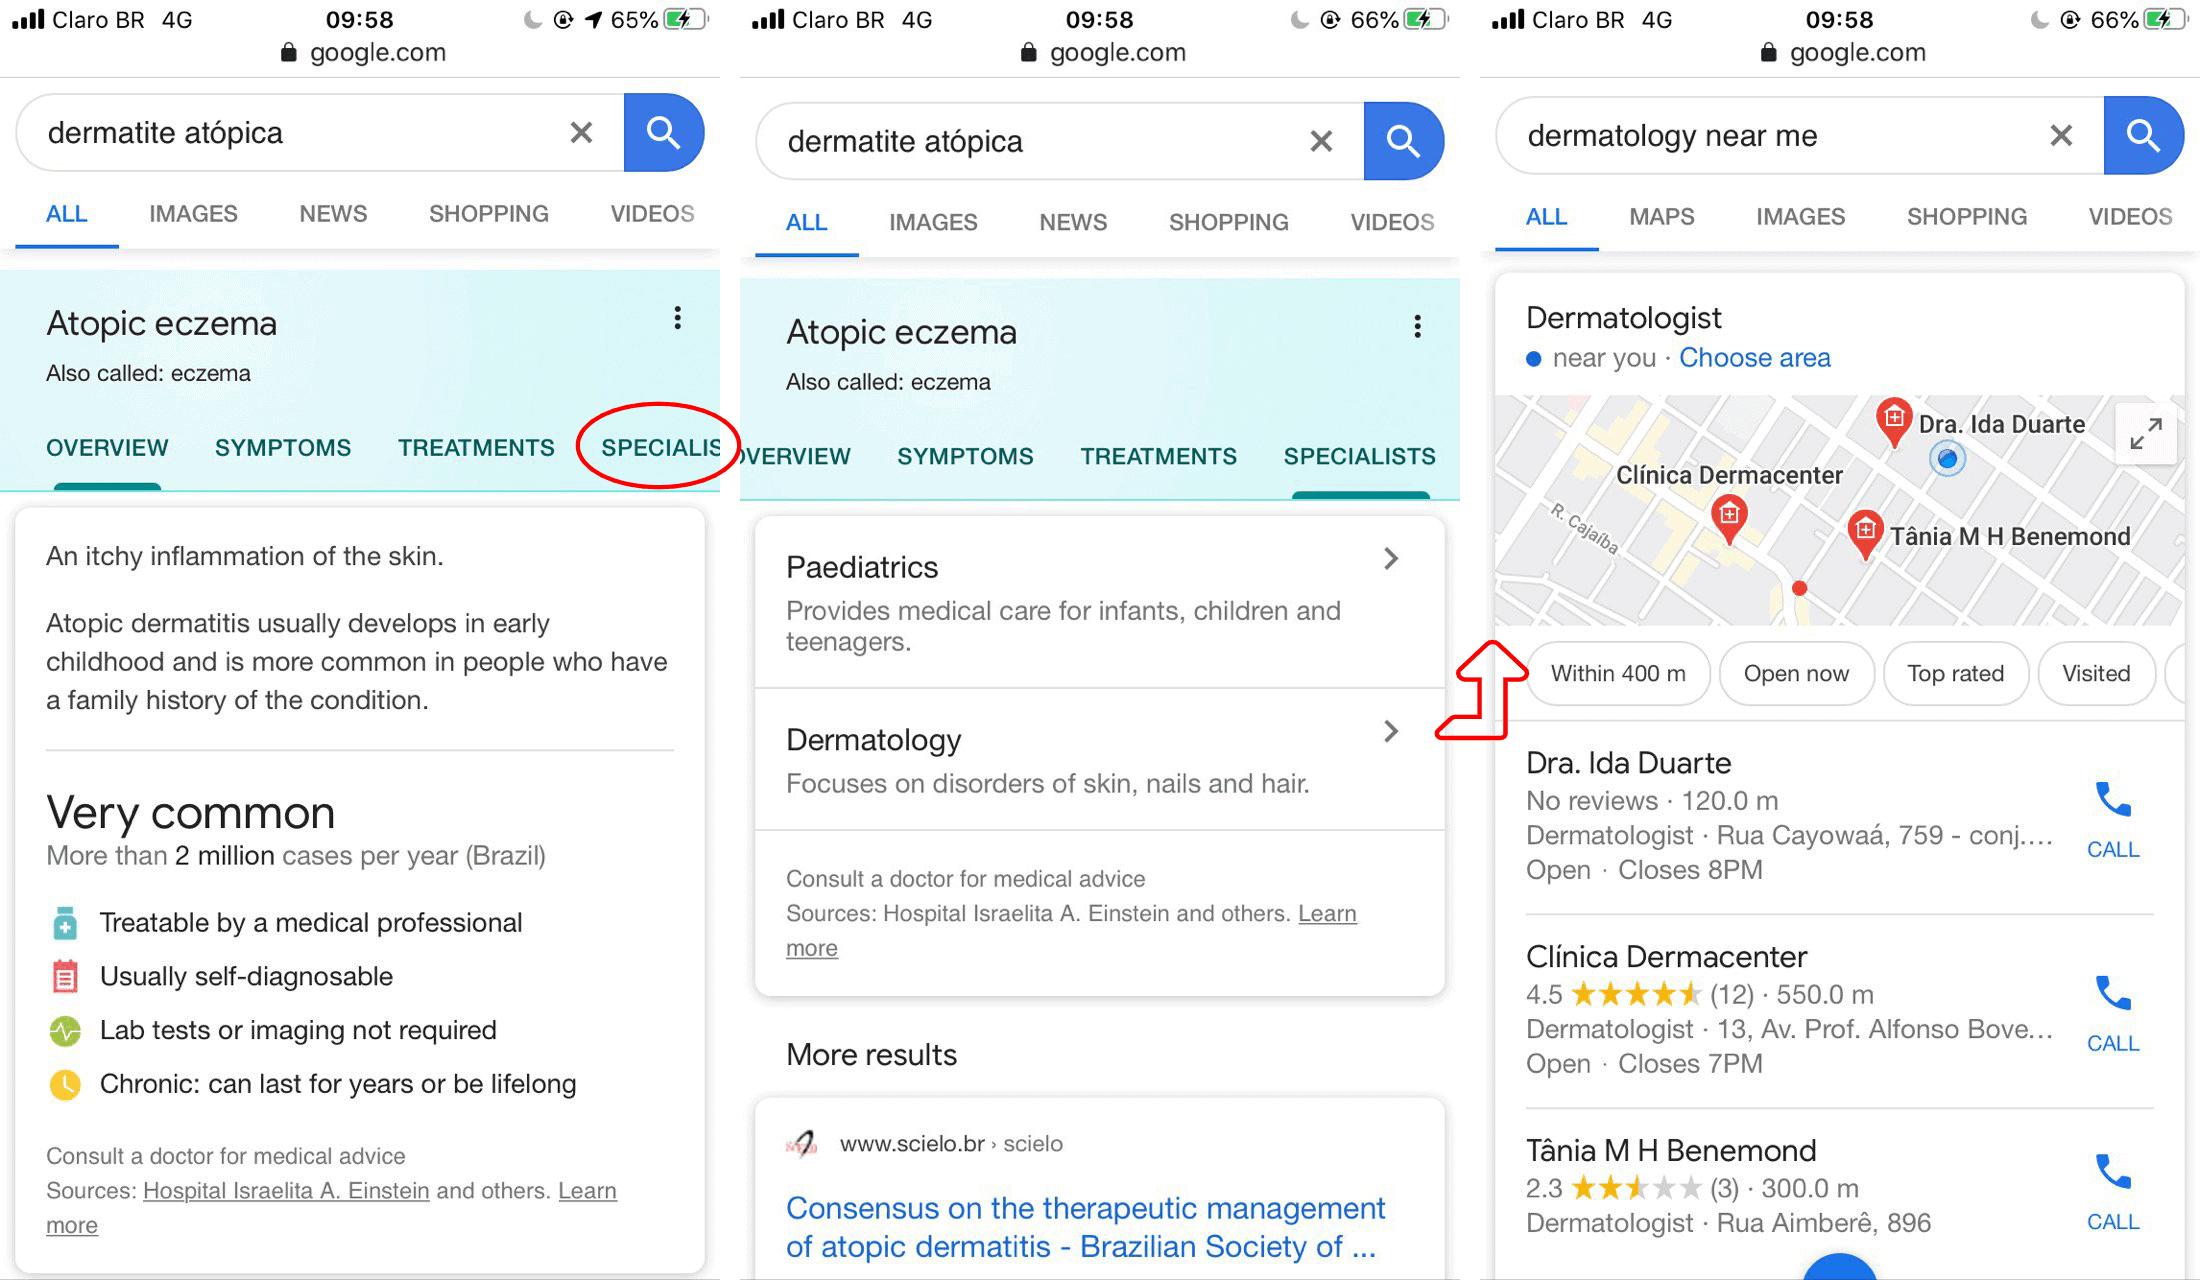 google health search